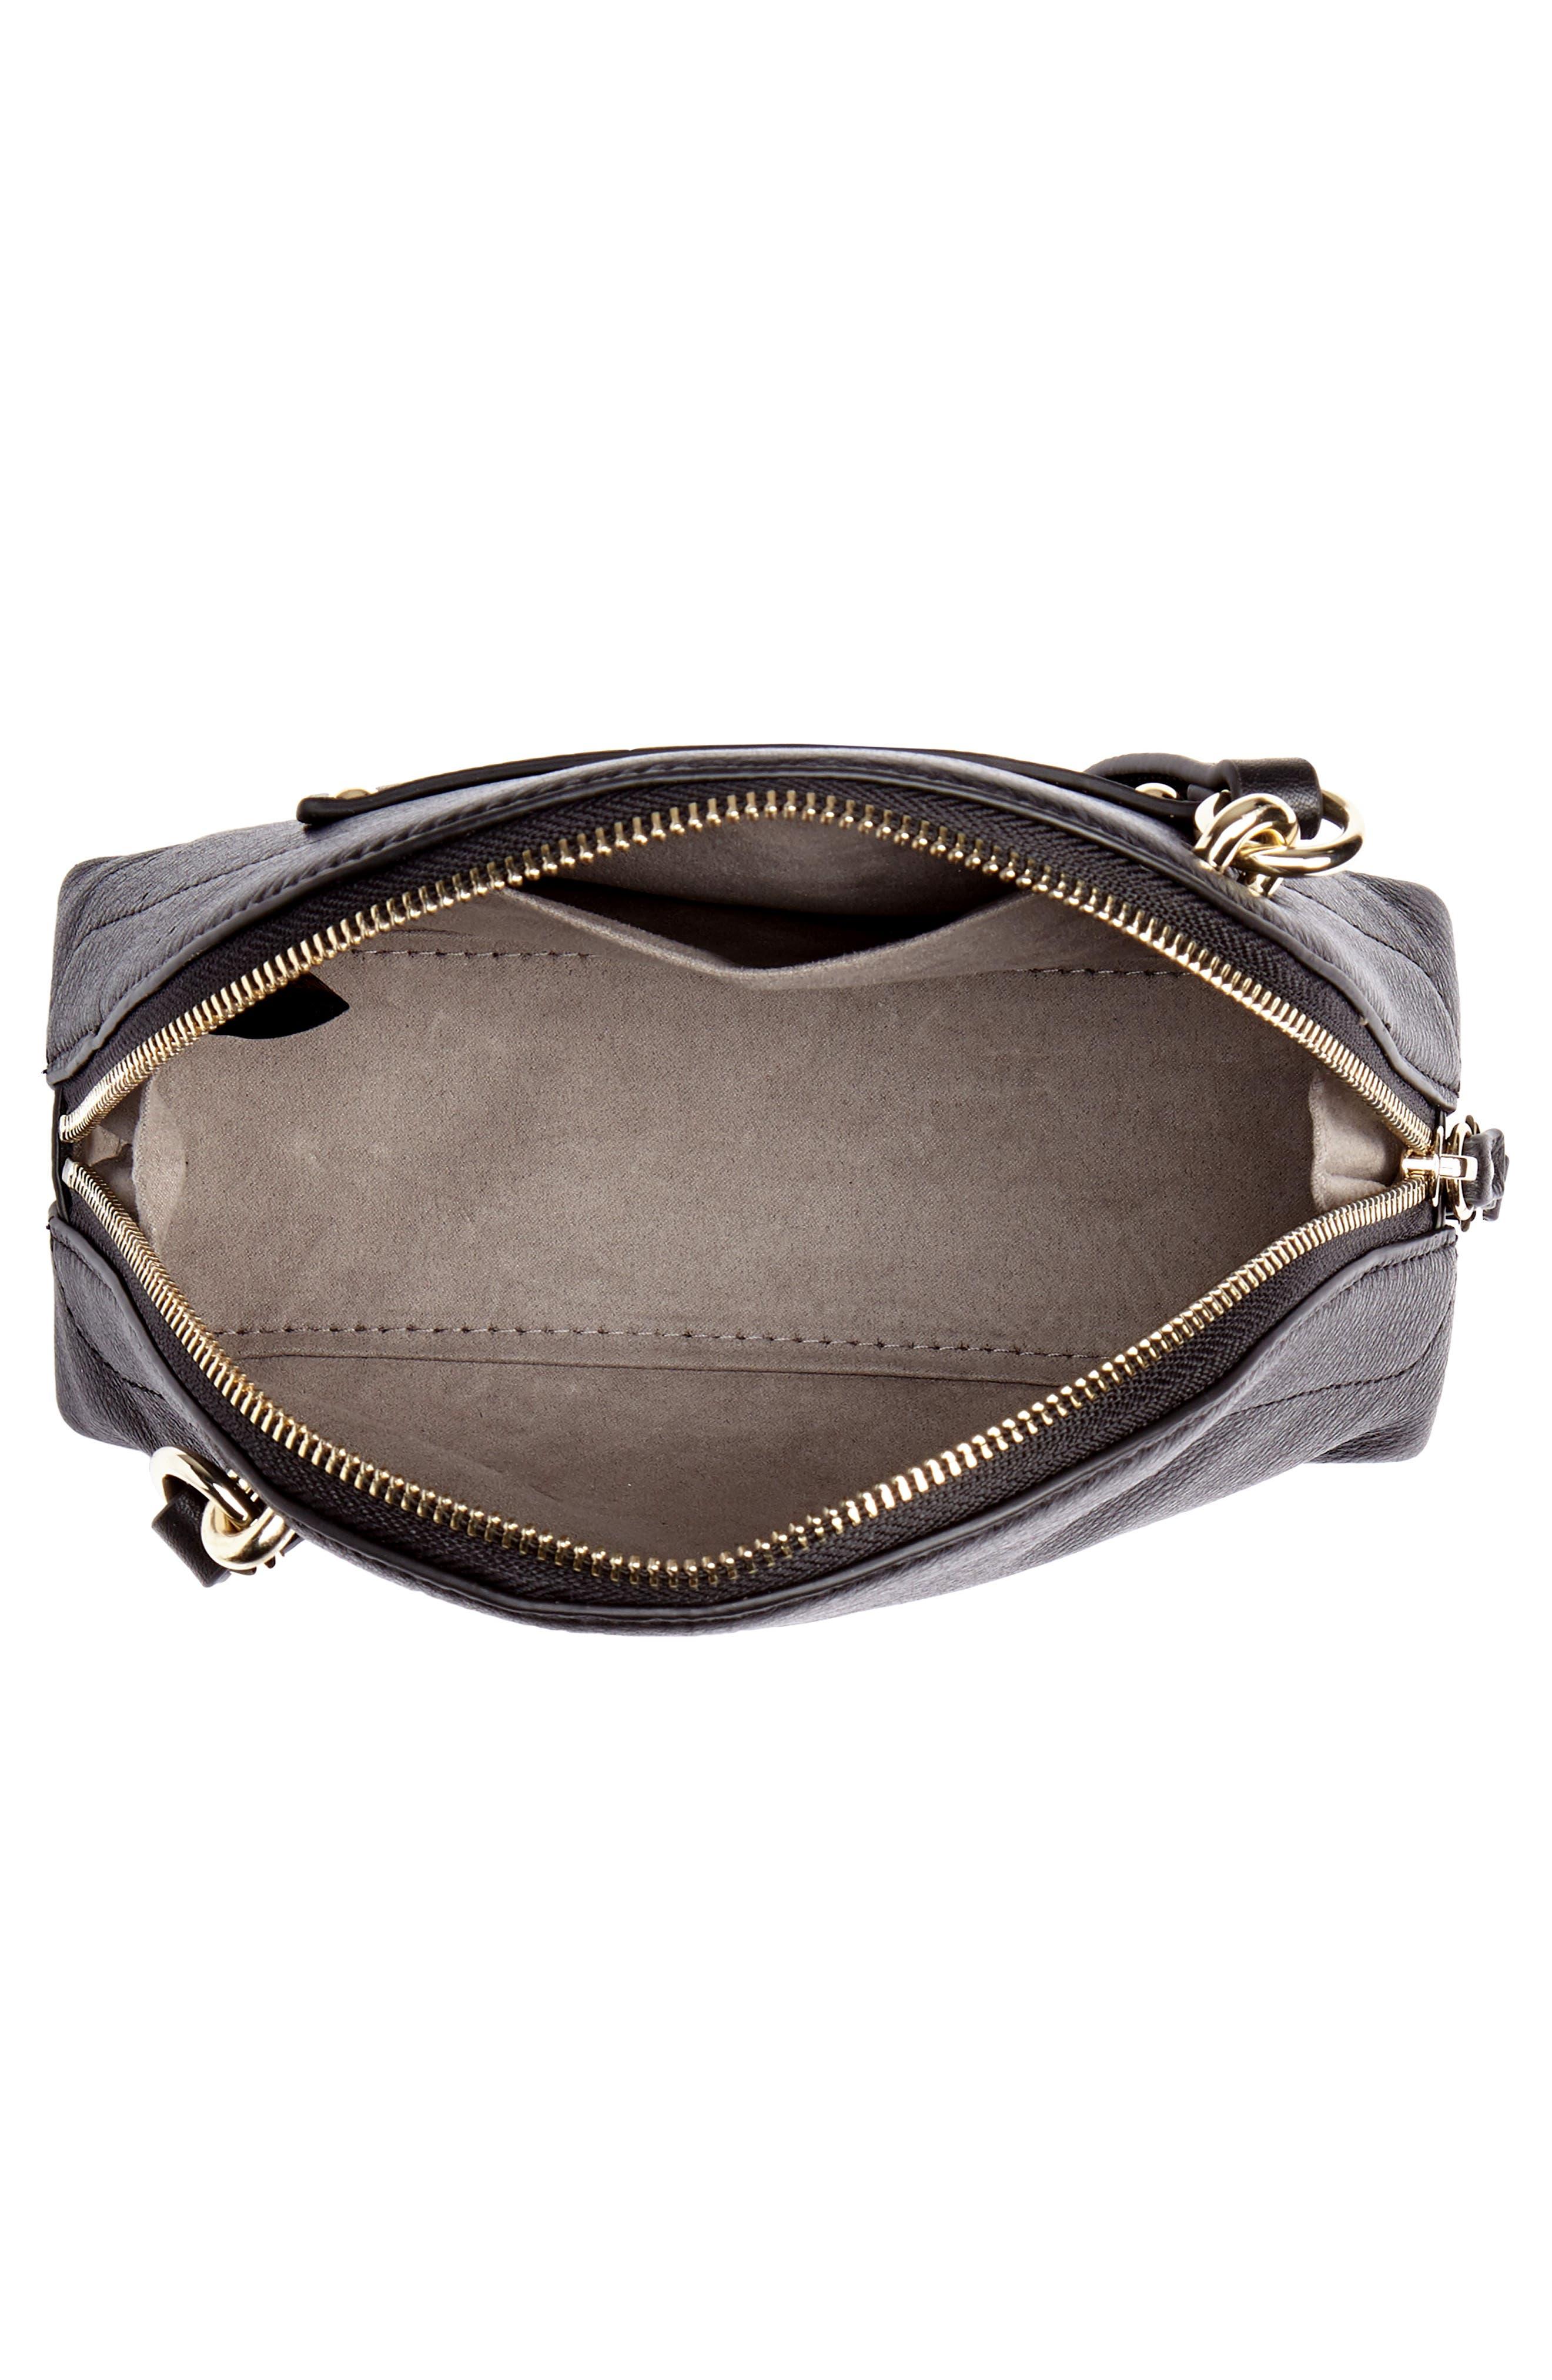 Katja Leather Half-Moon Crossbody Bag,                             Alternate thumbnail 4, color,                             001